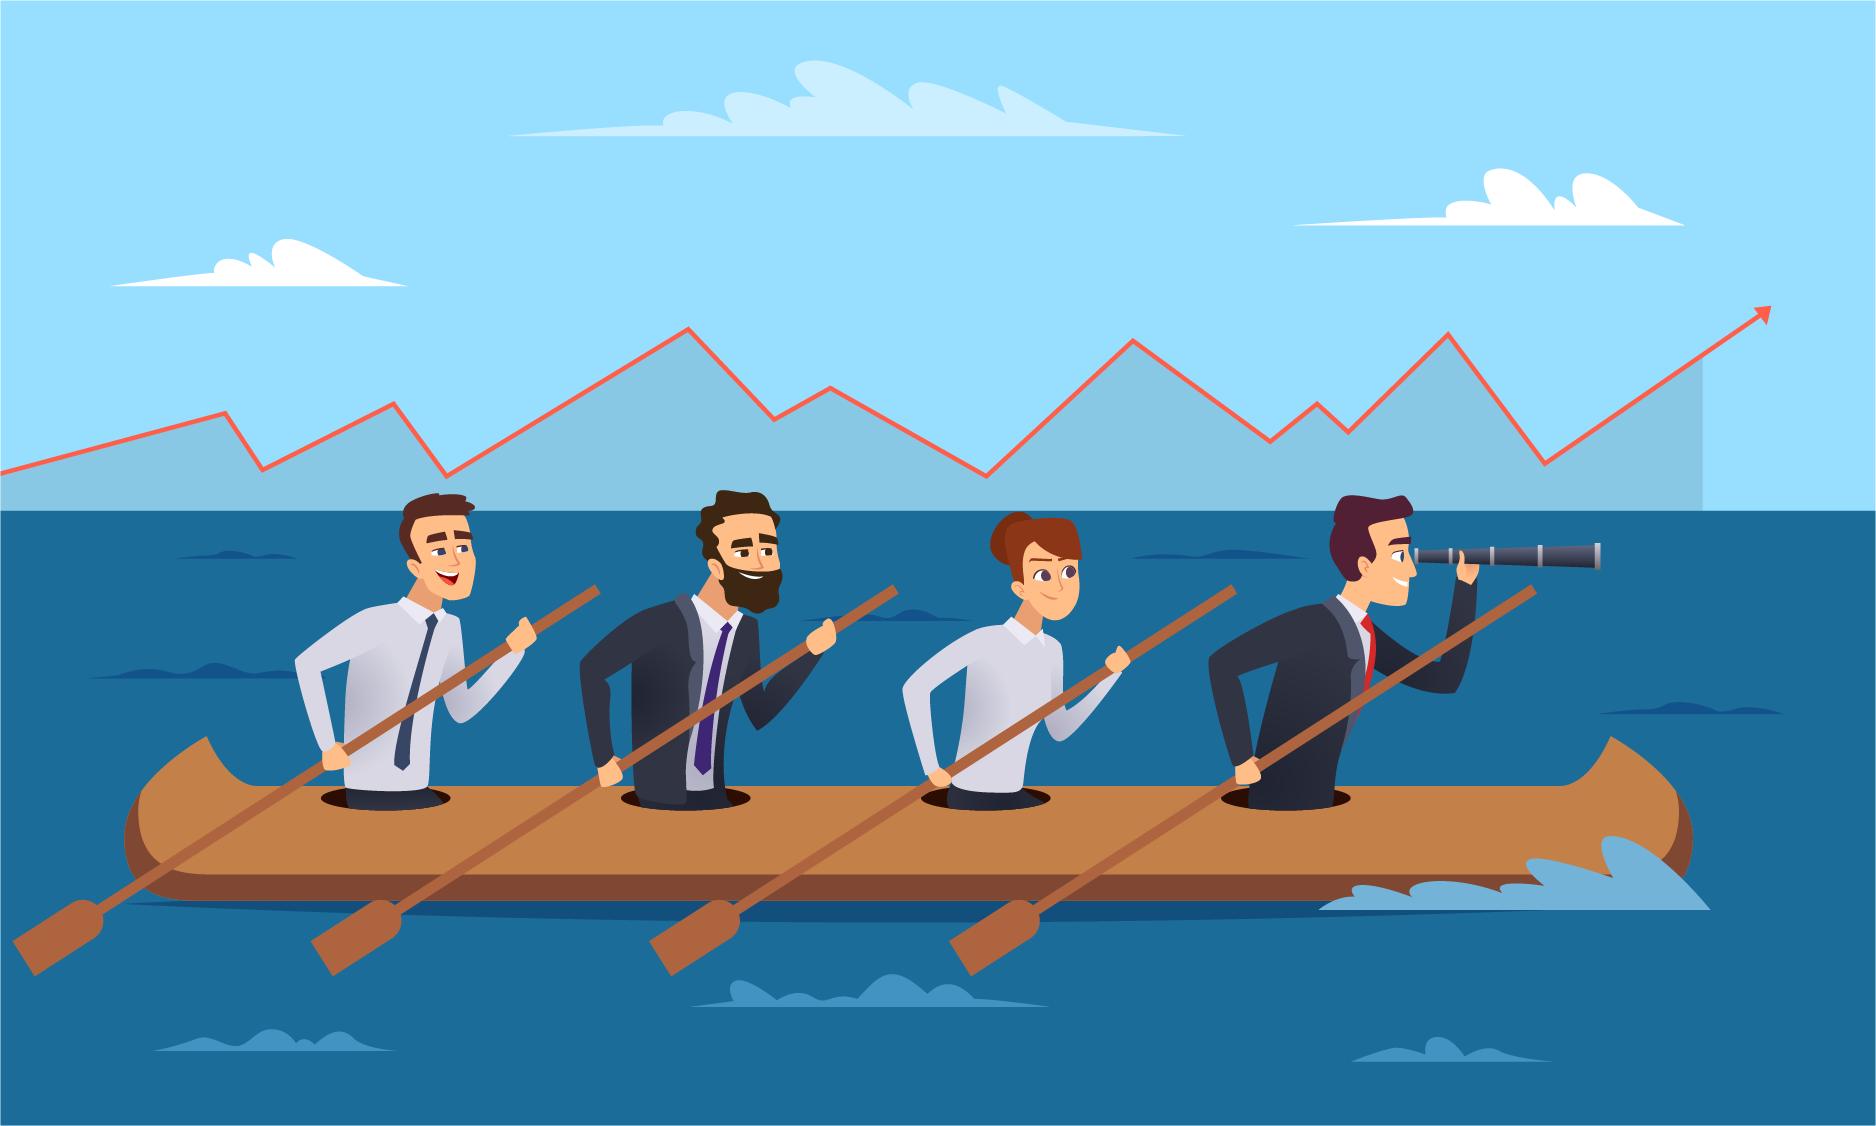 Structural vs. Entrepreneurial Leadership